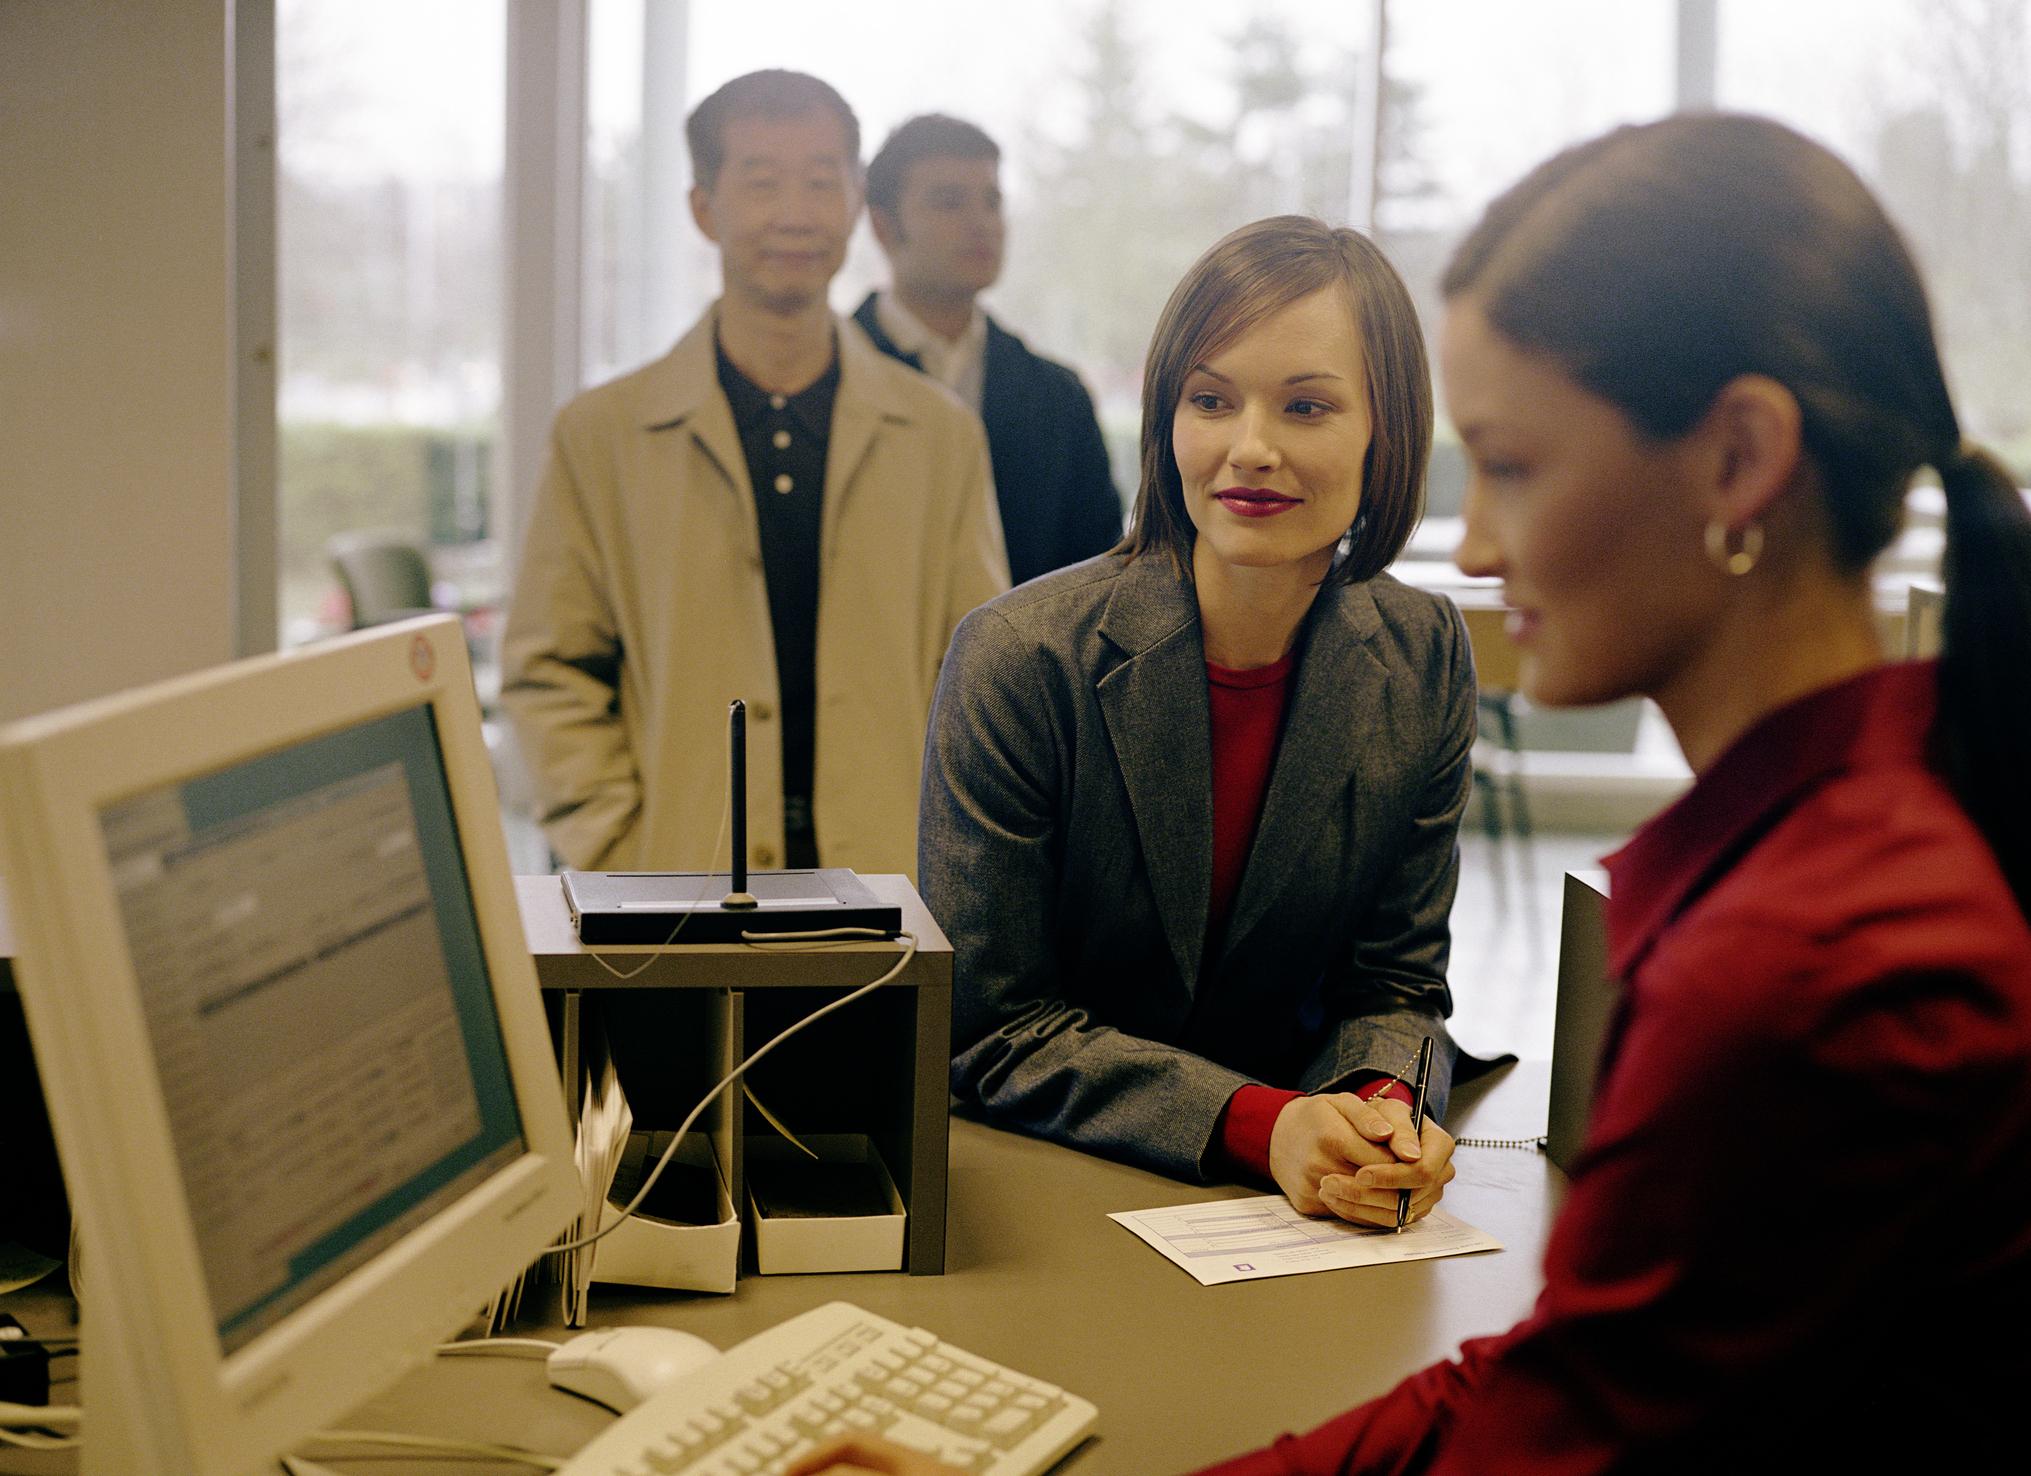 A bank teller helping customers.